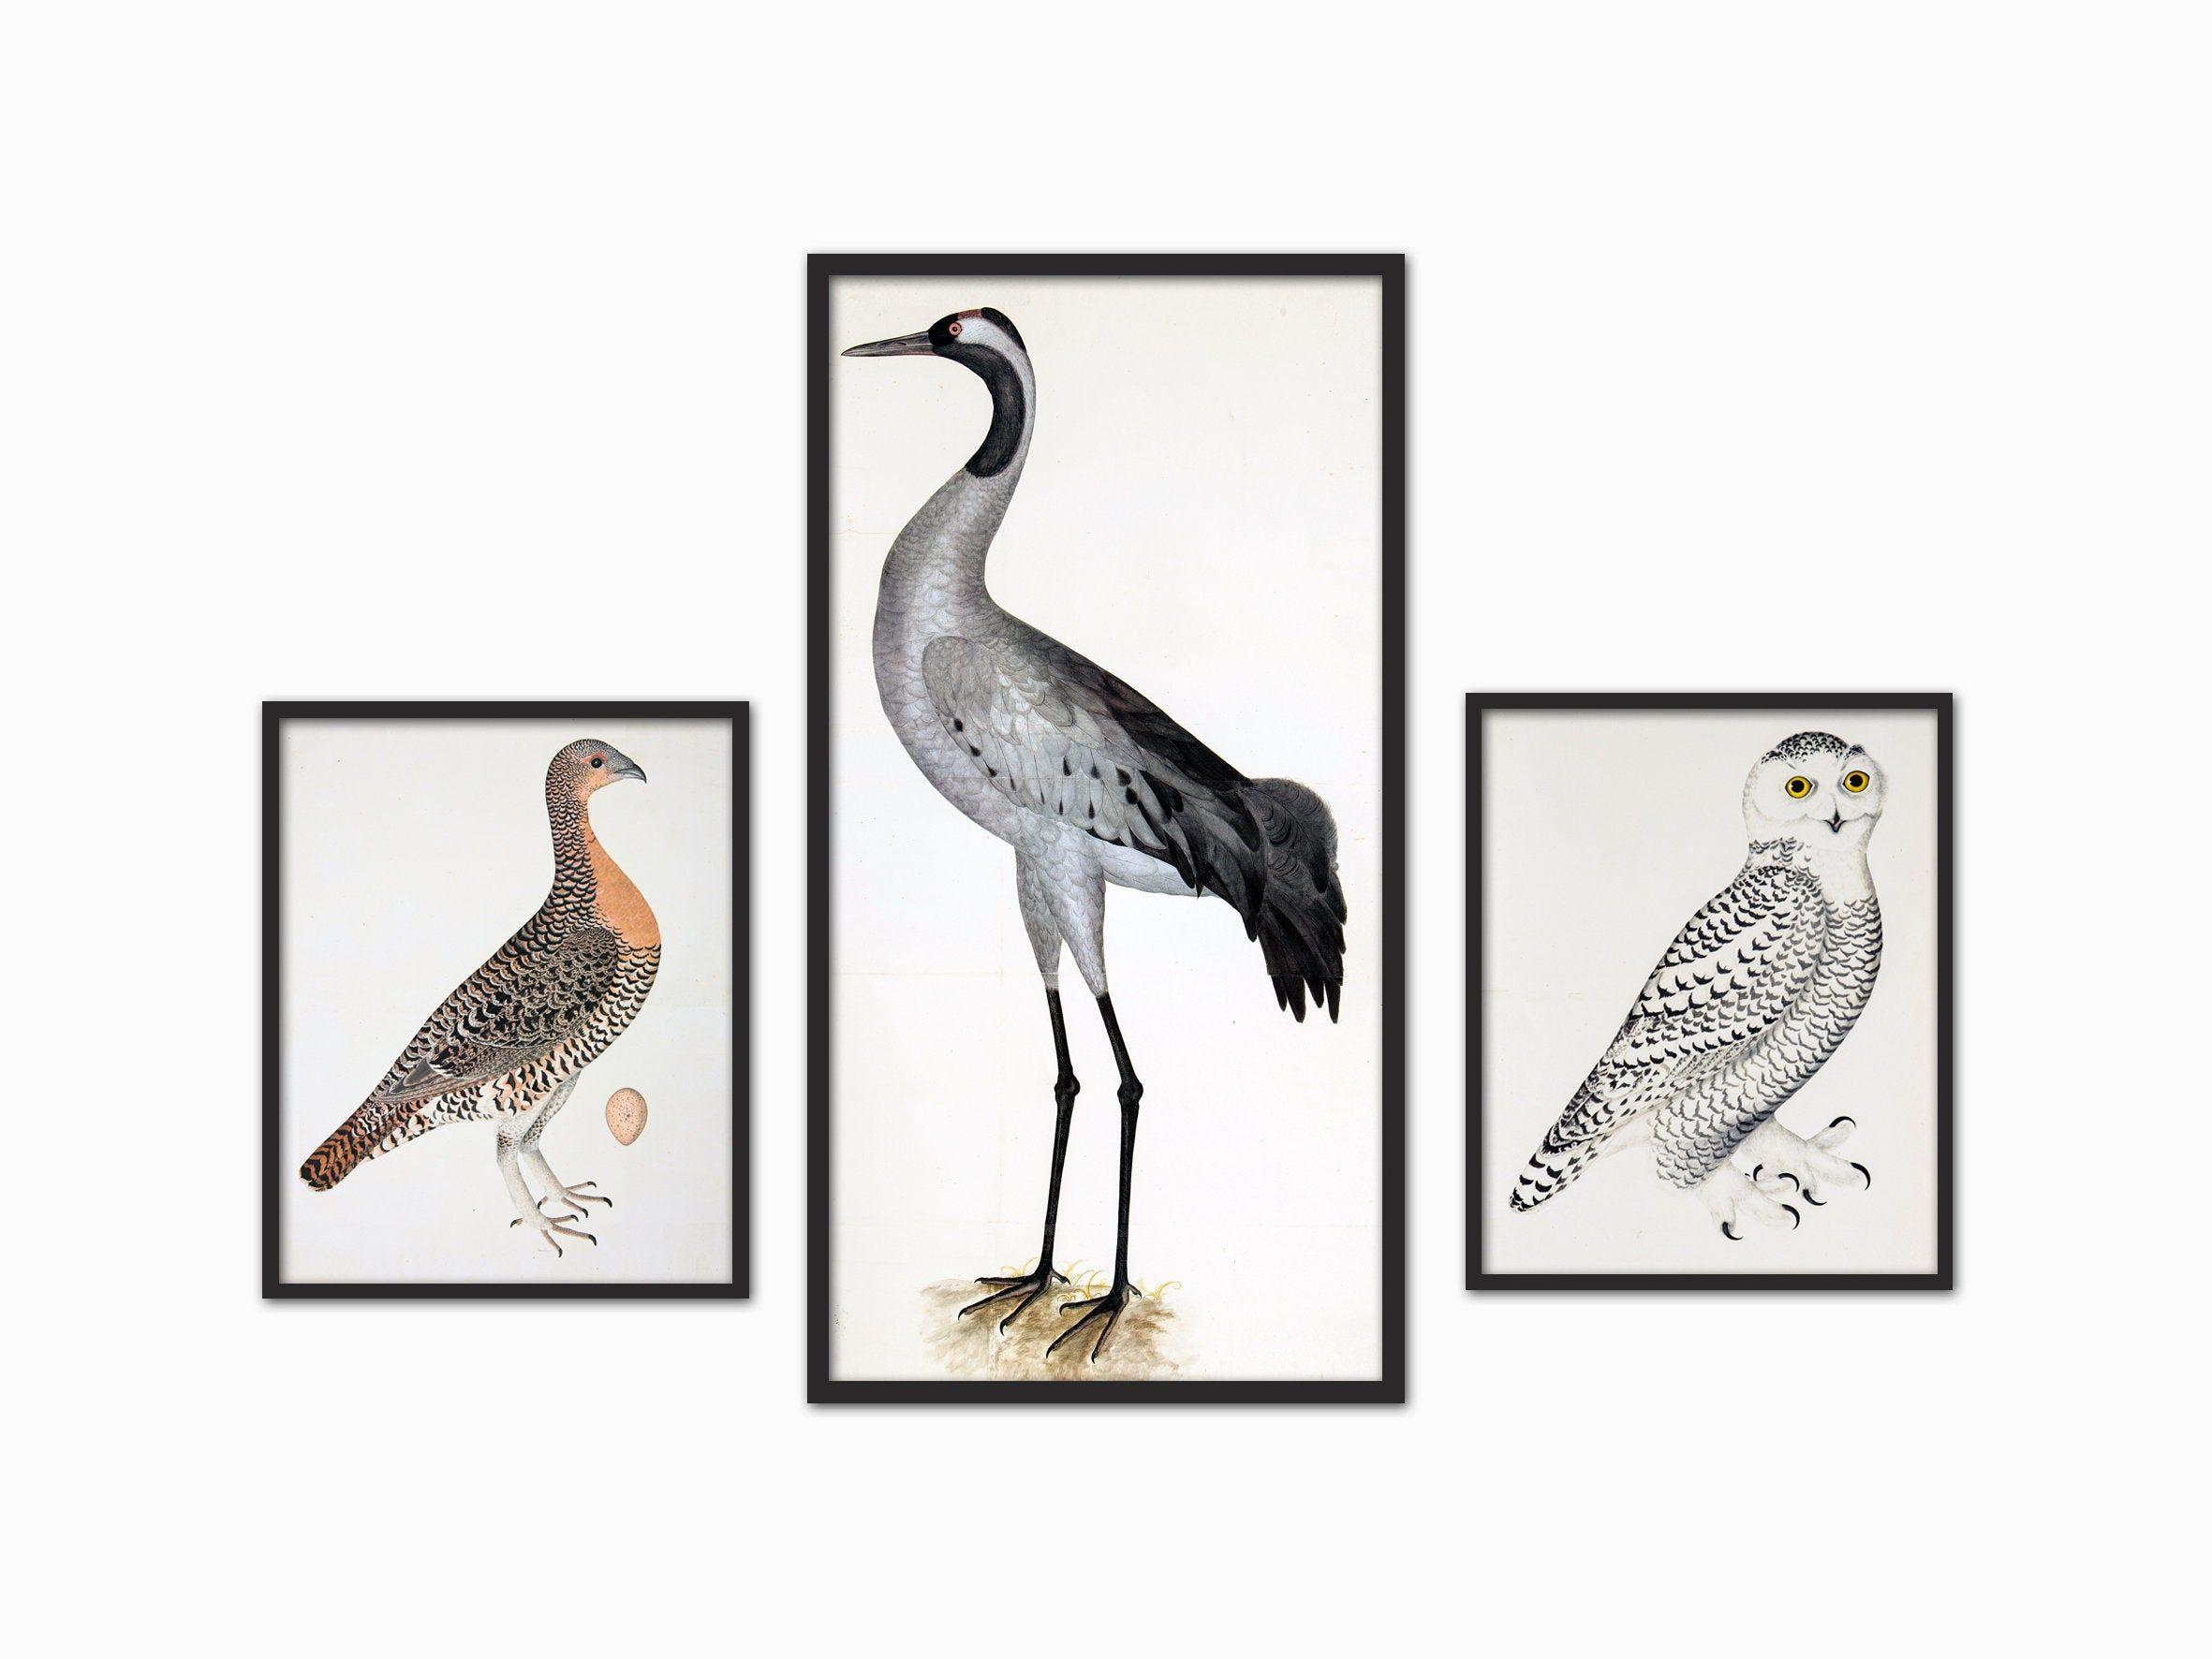 Large Birds Print Set Of 3 Bird Wall Decor Heron And Owl Etsy In 2020 Antique Bird Illustration Bird Prints Bird Illustration